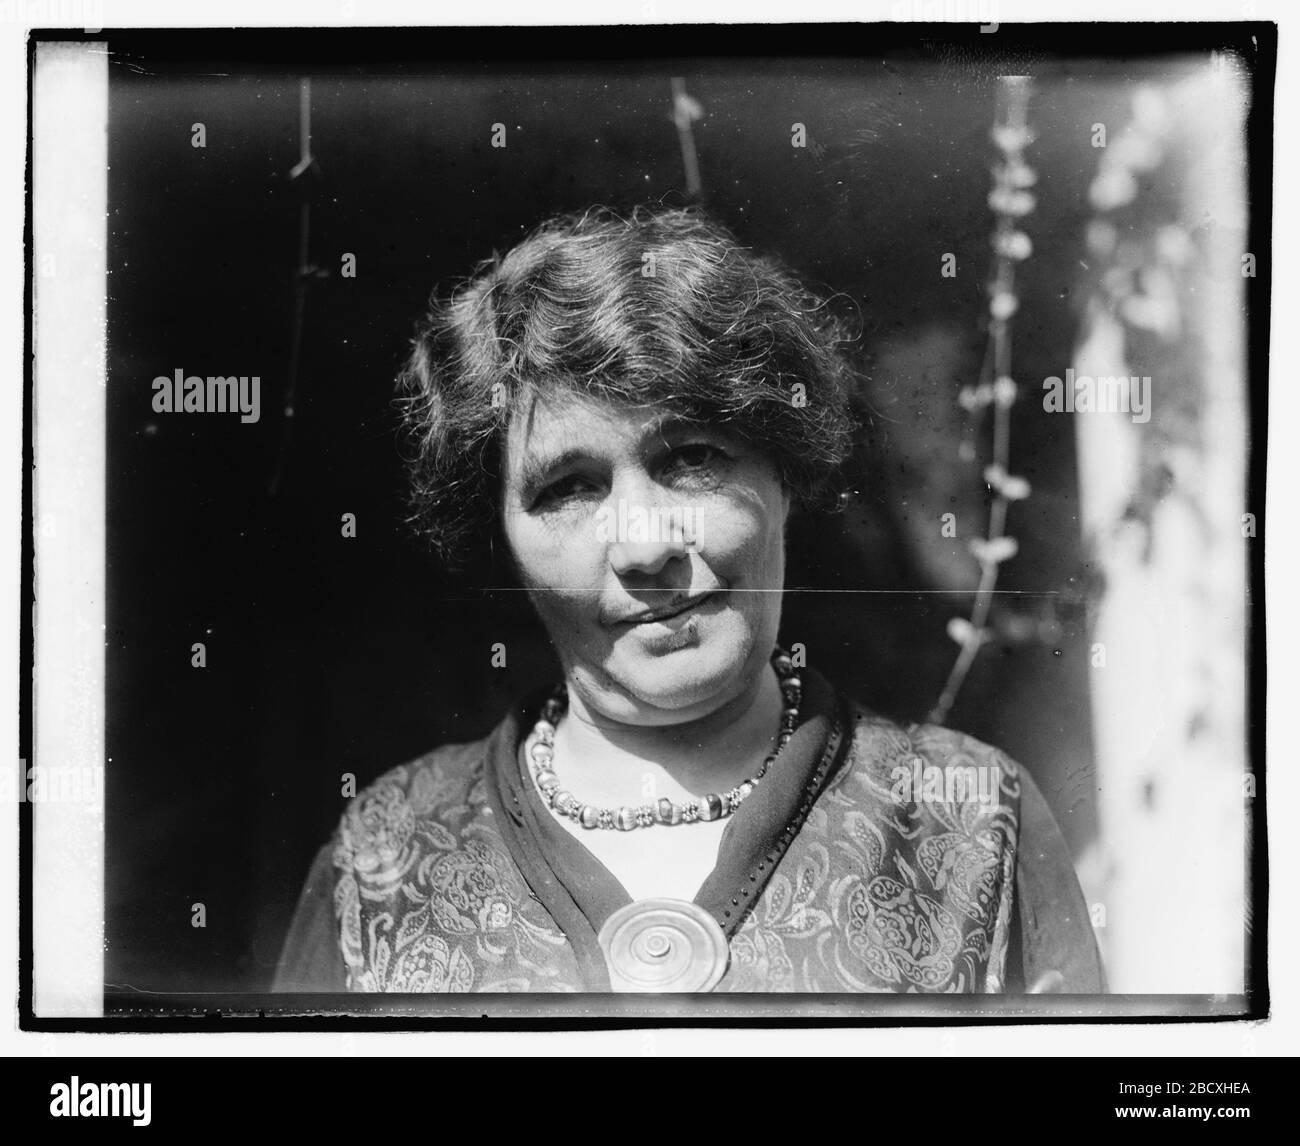 """Deutsch: Titel: Alice Paul und Frau Pethick-Laurence Abstract/Medium: 1 negativ : Glas; 4 x 5 Zoll oder kleiner; 1920; Bibliothek des Kongresskatalogs: https://lccn.loc.gov/2016828995 Bilddownload: https://cdn.loc.gov/service/pnp/npcc/02700/02761v.jpg Original-url: https://www.loc.gov/pictures/item/2016828995/; National Photo Company Collection; ' Stockfoto"